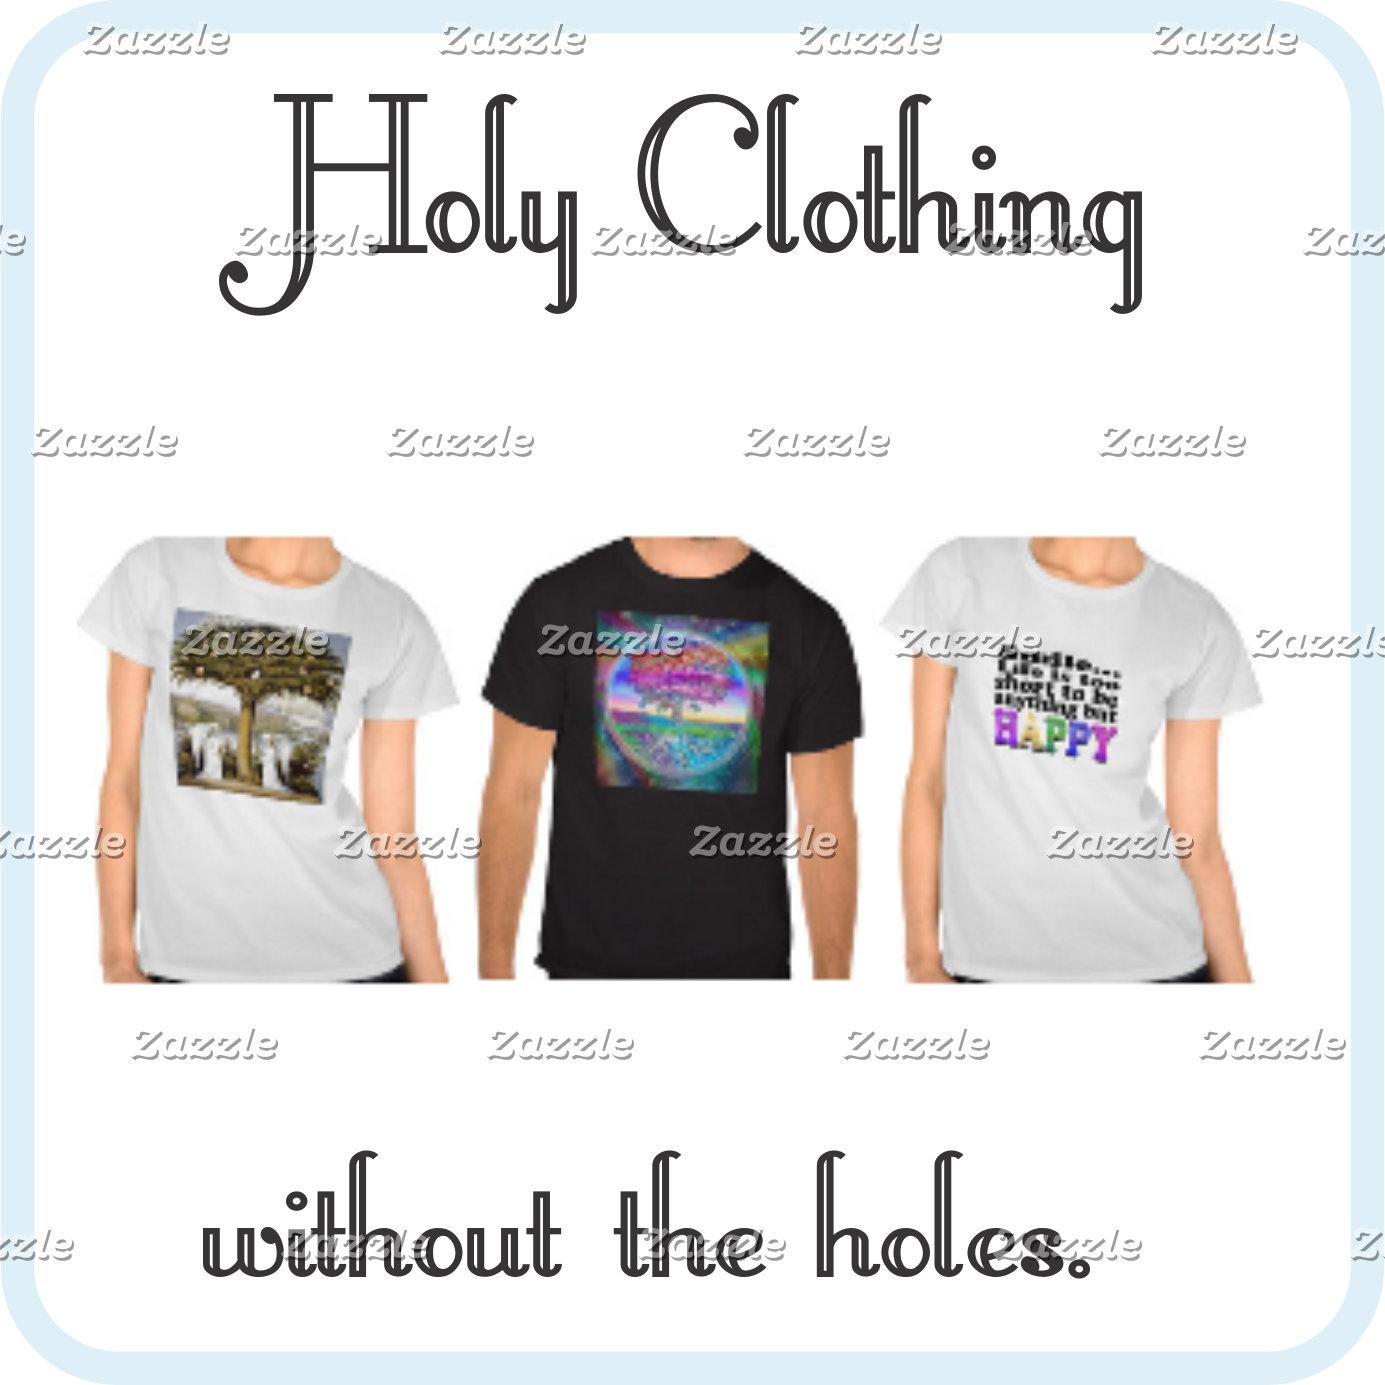 ❤ Shirts